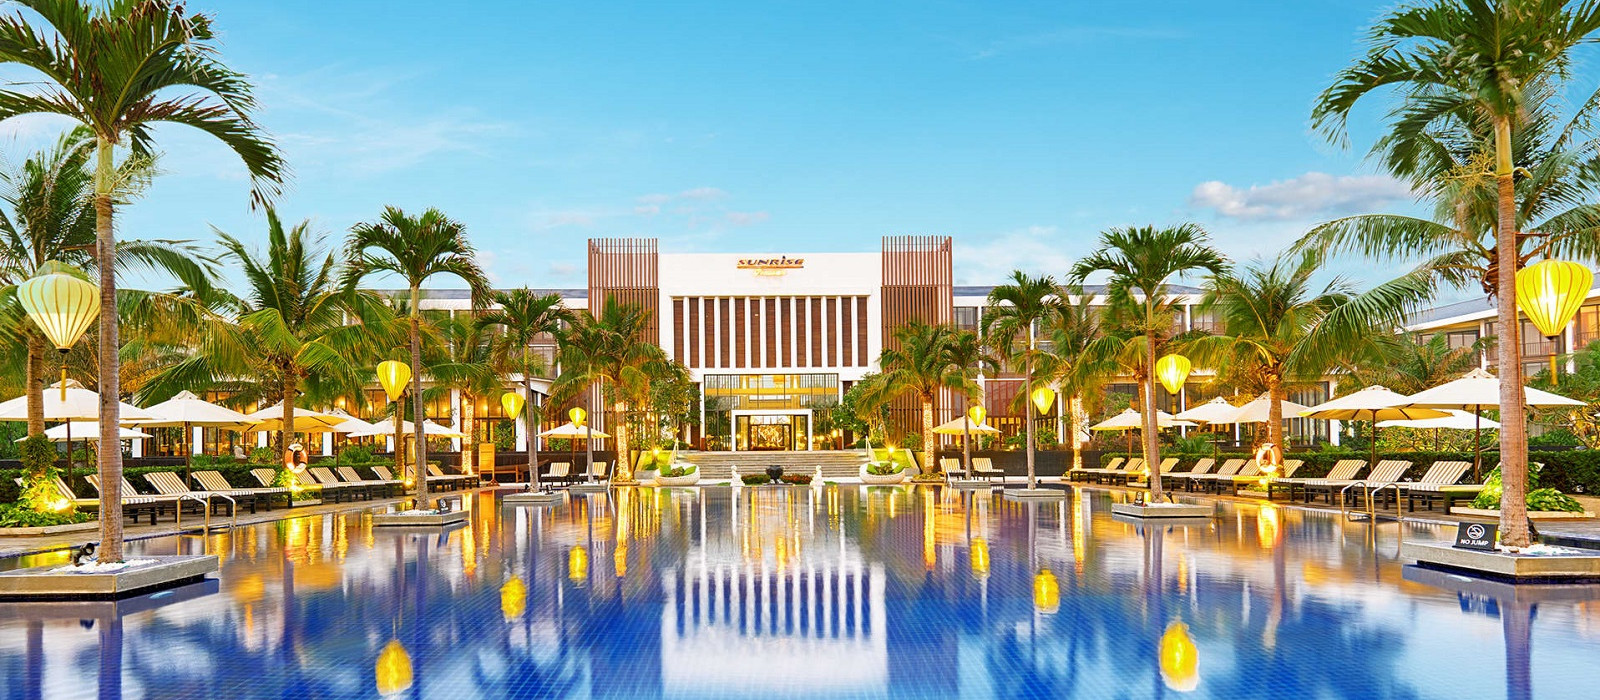 Hotel Sunrise Premium Resort & Spa Hoi An Vietnam